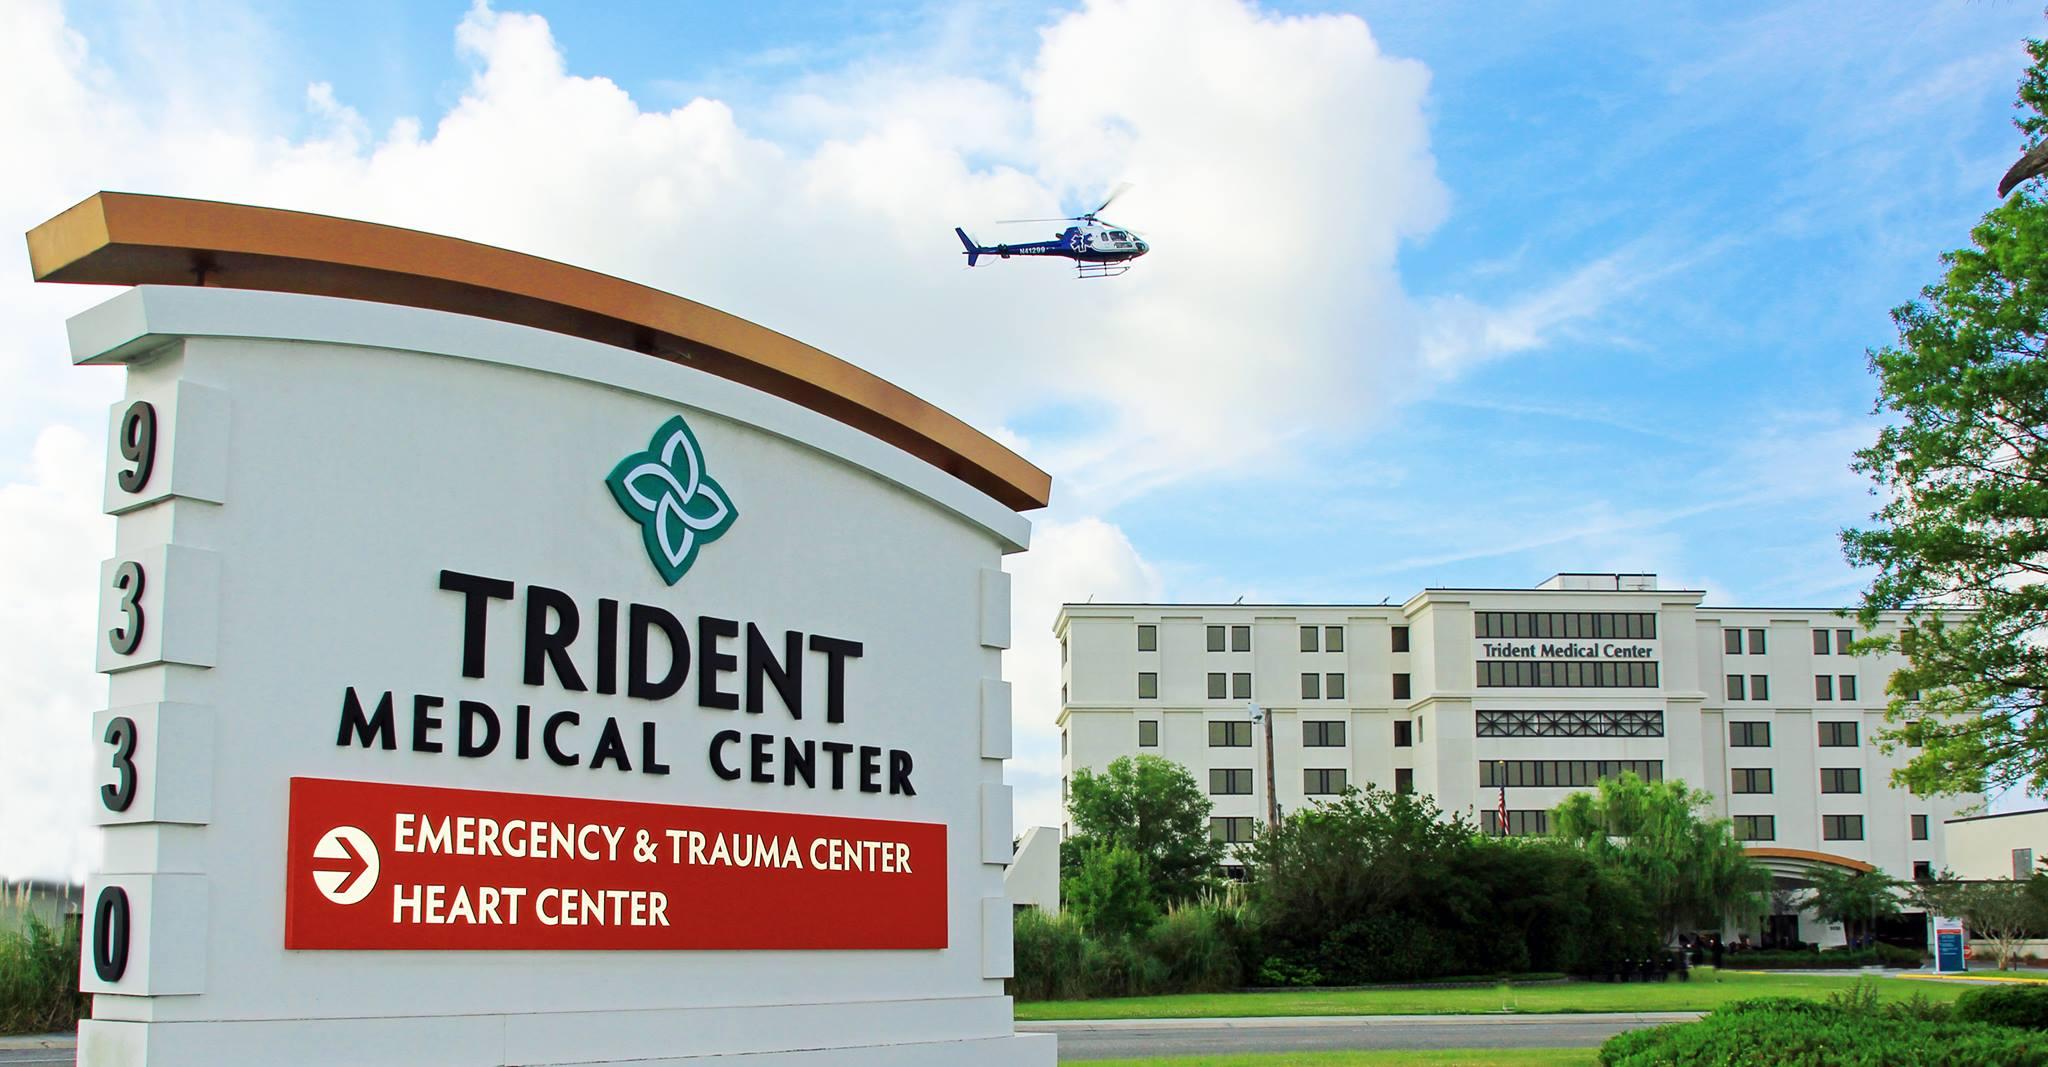 trident-medical-center